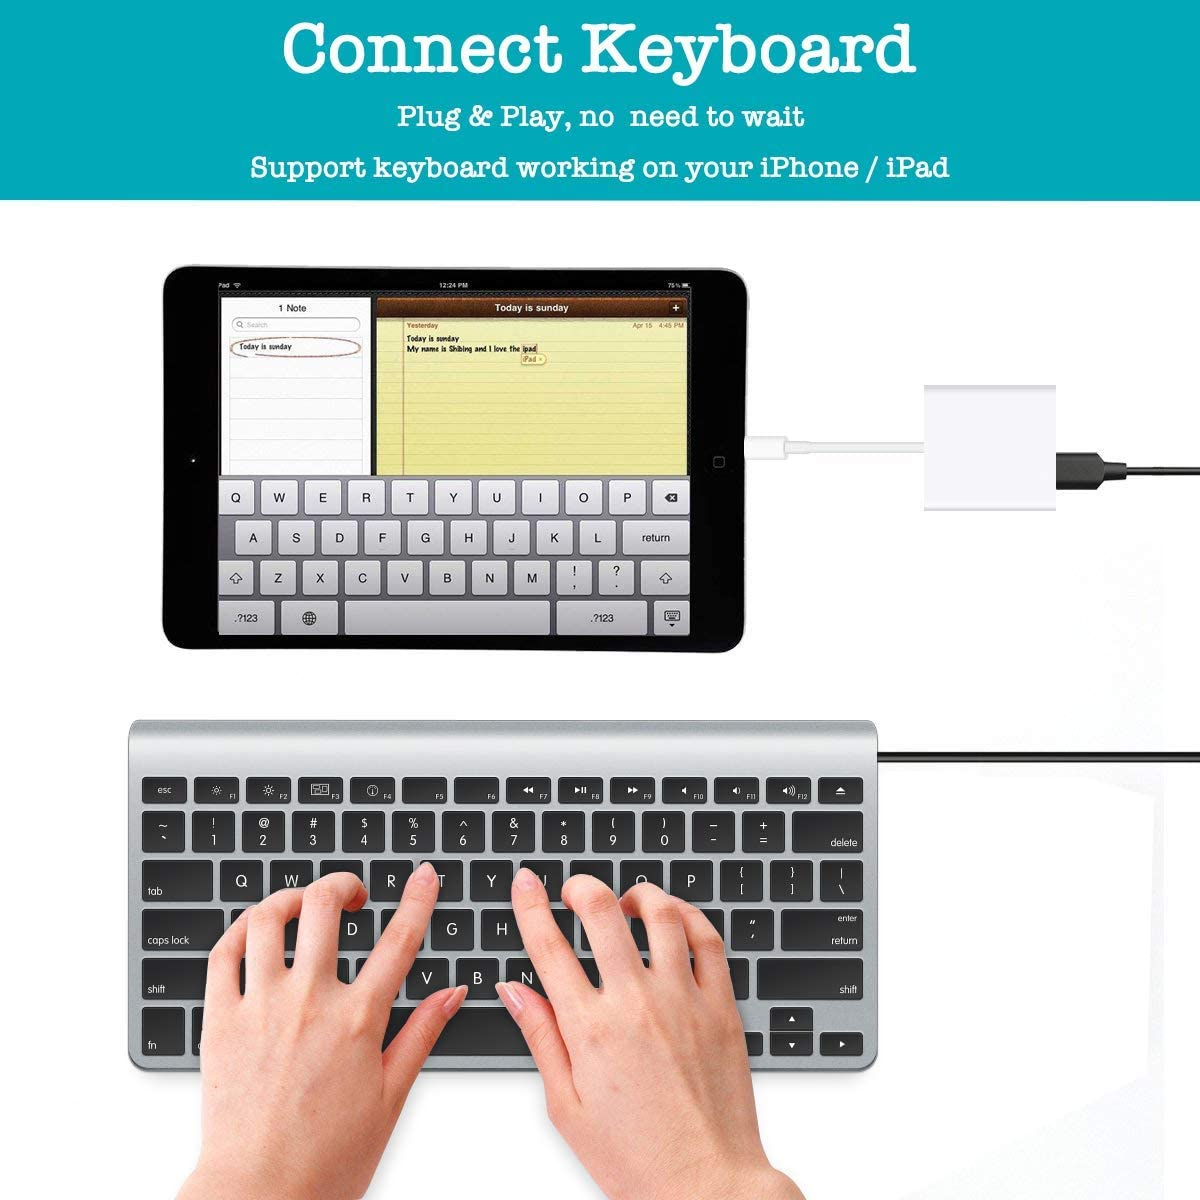 Adaptador de c/ámara USB,adaptador de cable de sincronizaci/ón de datos OTG hembra USB 3.0 compatible con iPhone x 8 7//iPad Air Pro Mini negro lector de tarjetas de soporte,unidad flash USB,mouse